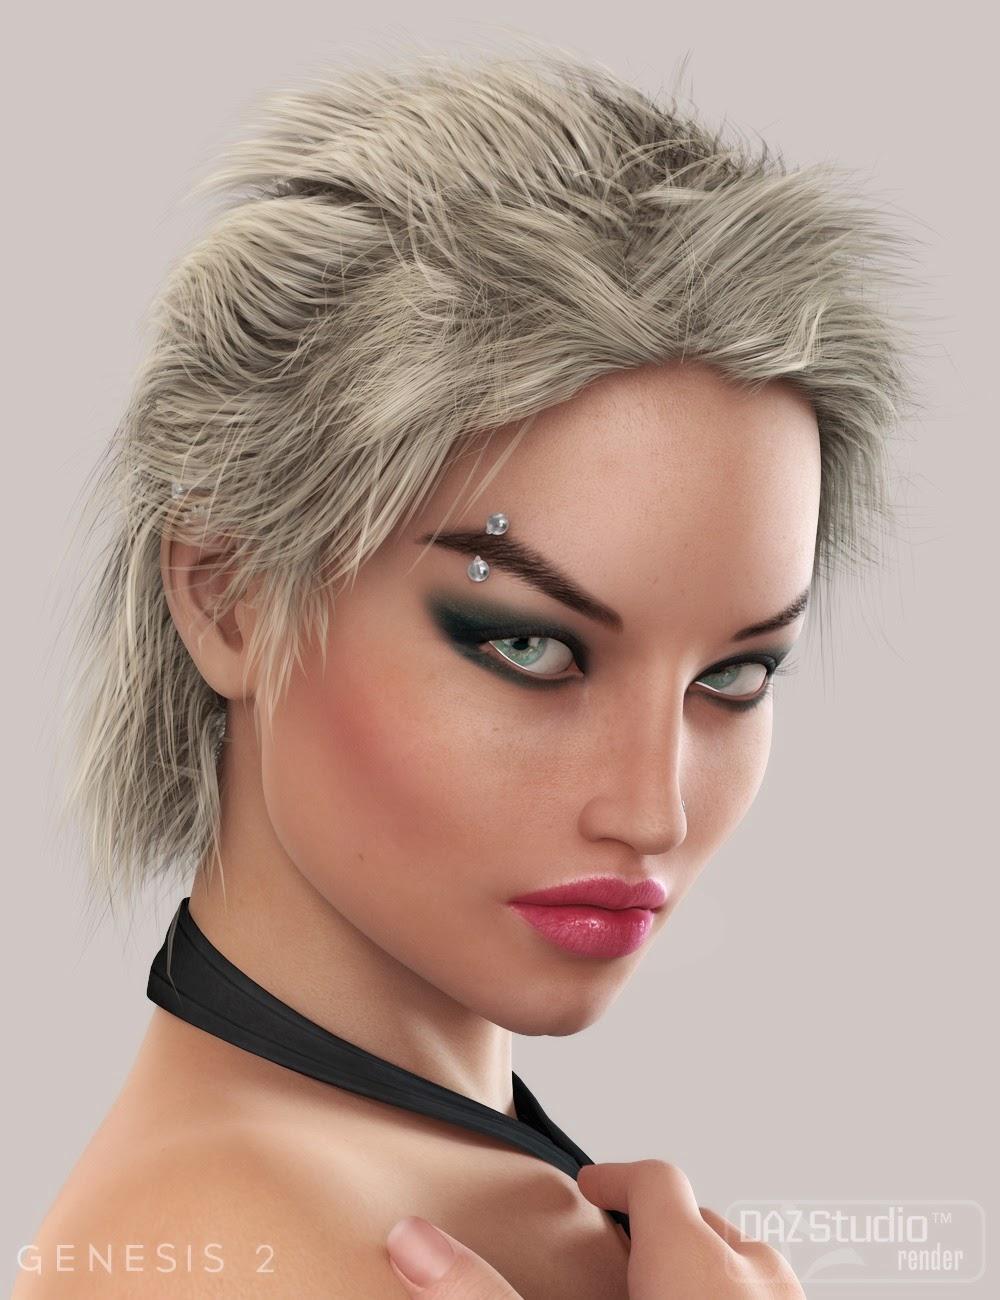 Daz genesis 2 hair